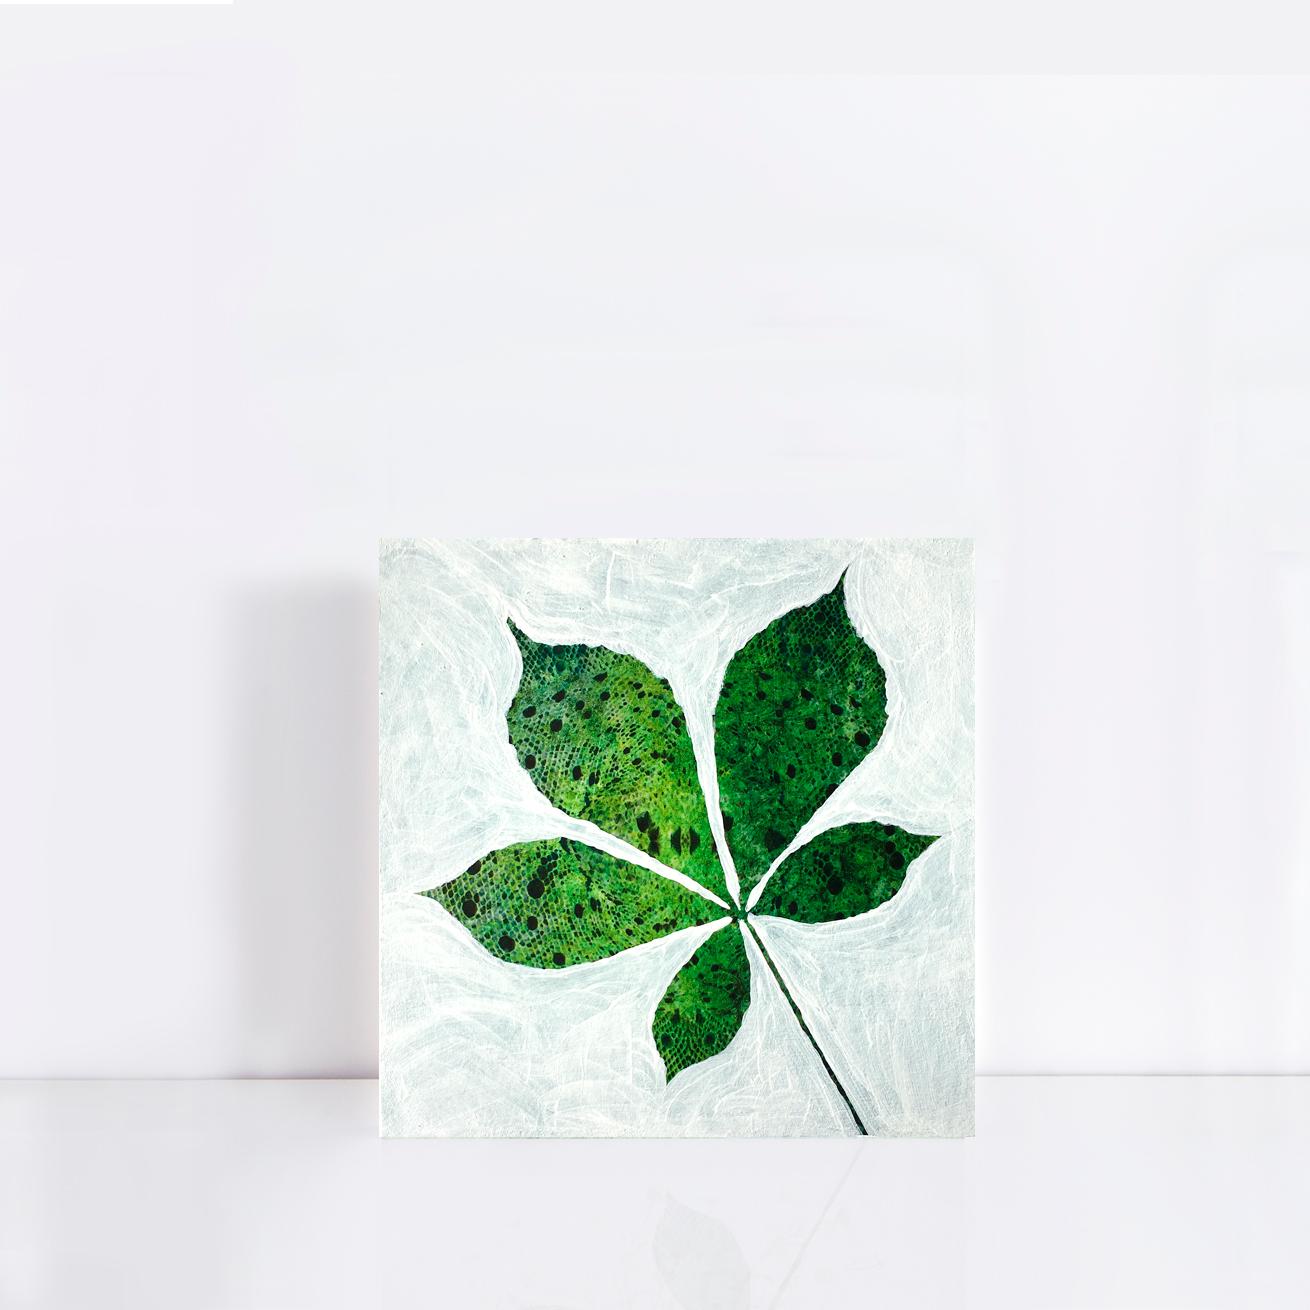 fineart-patterned-leaf-2f